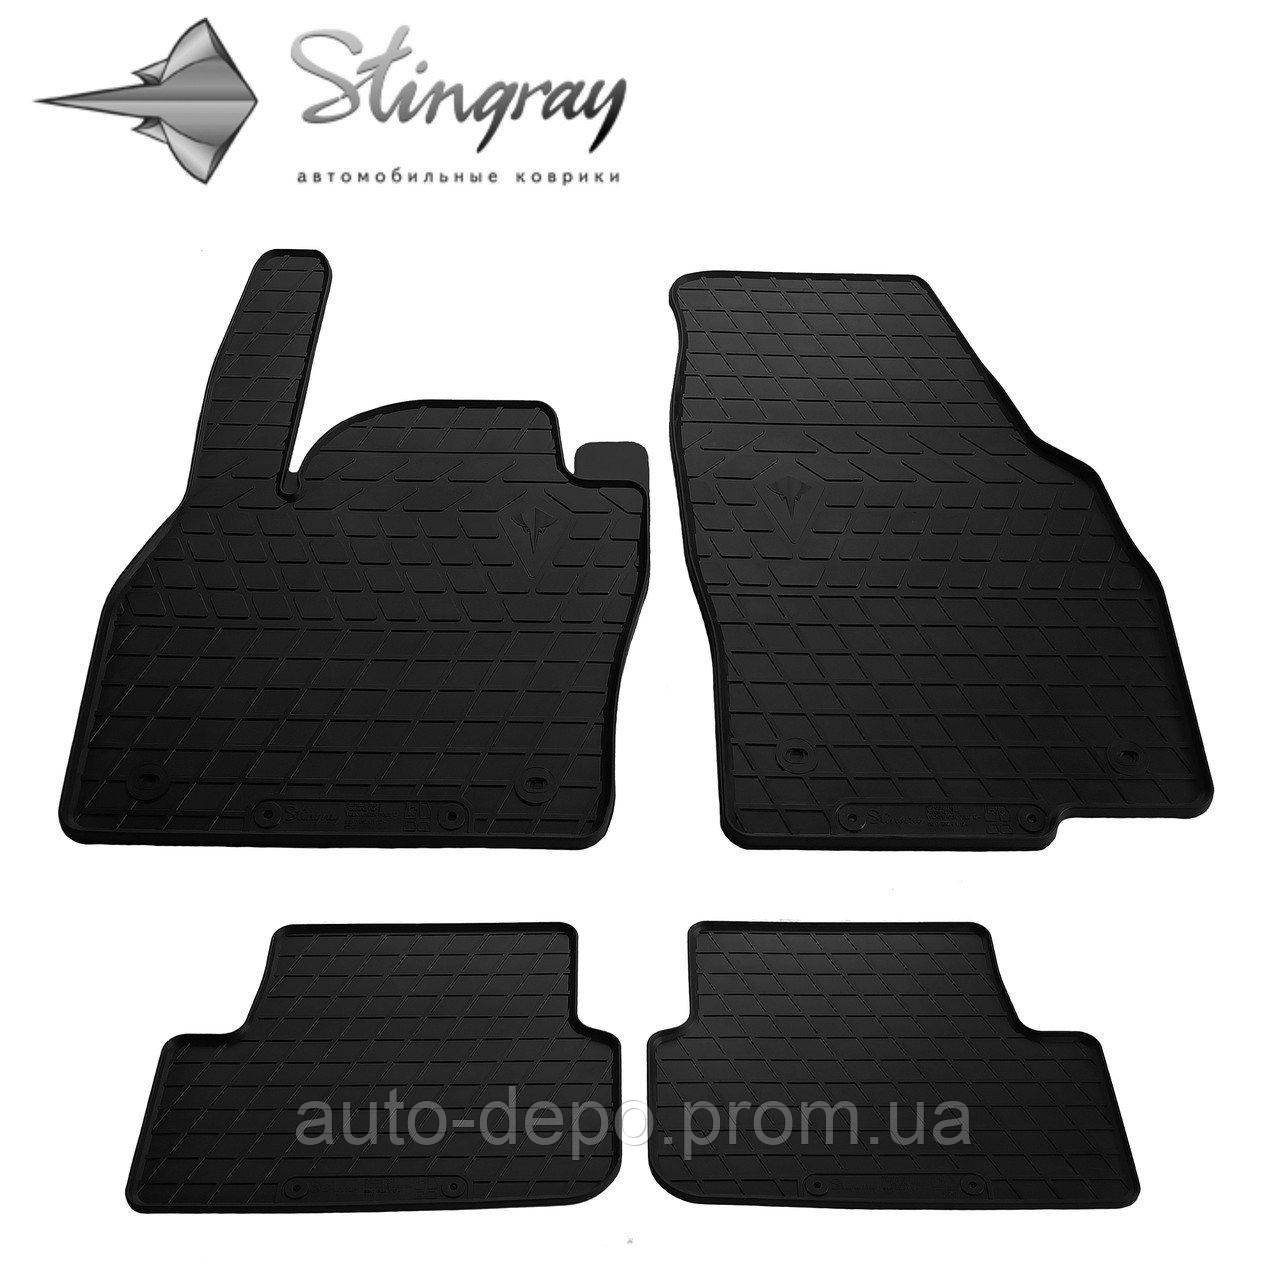 Килимки автомобільні для Volkswagen Polo Hatchback 2017 - Stingray